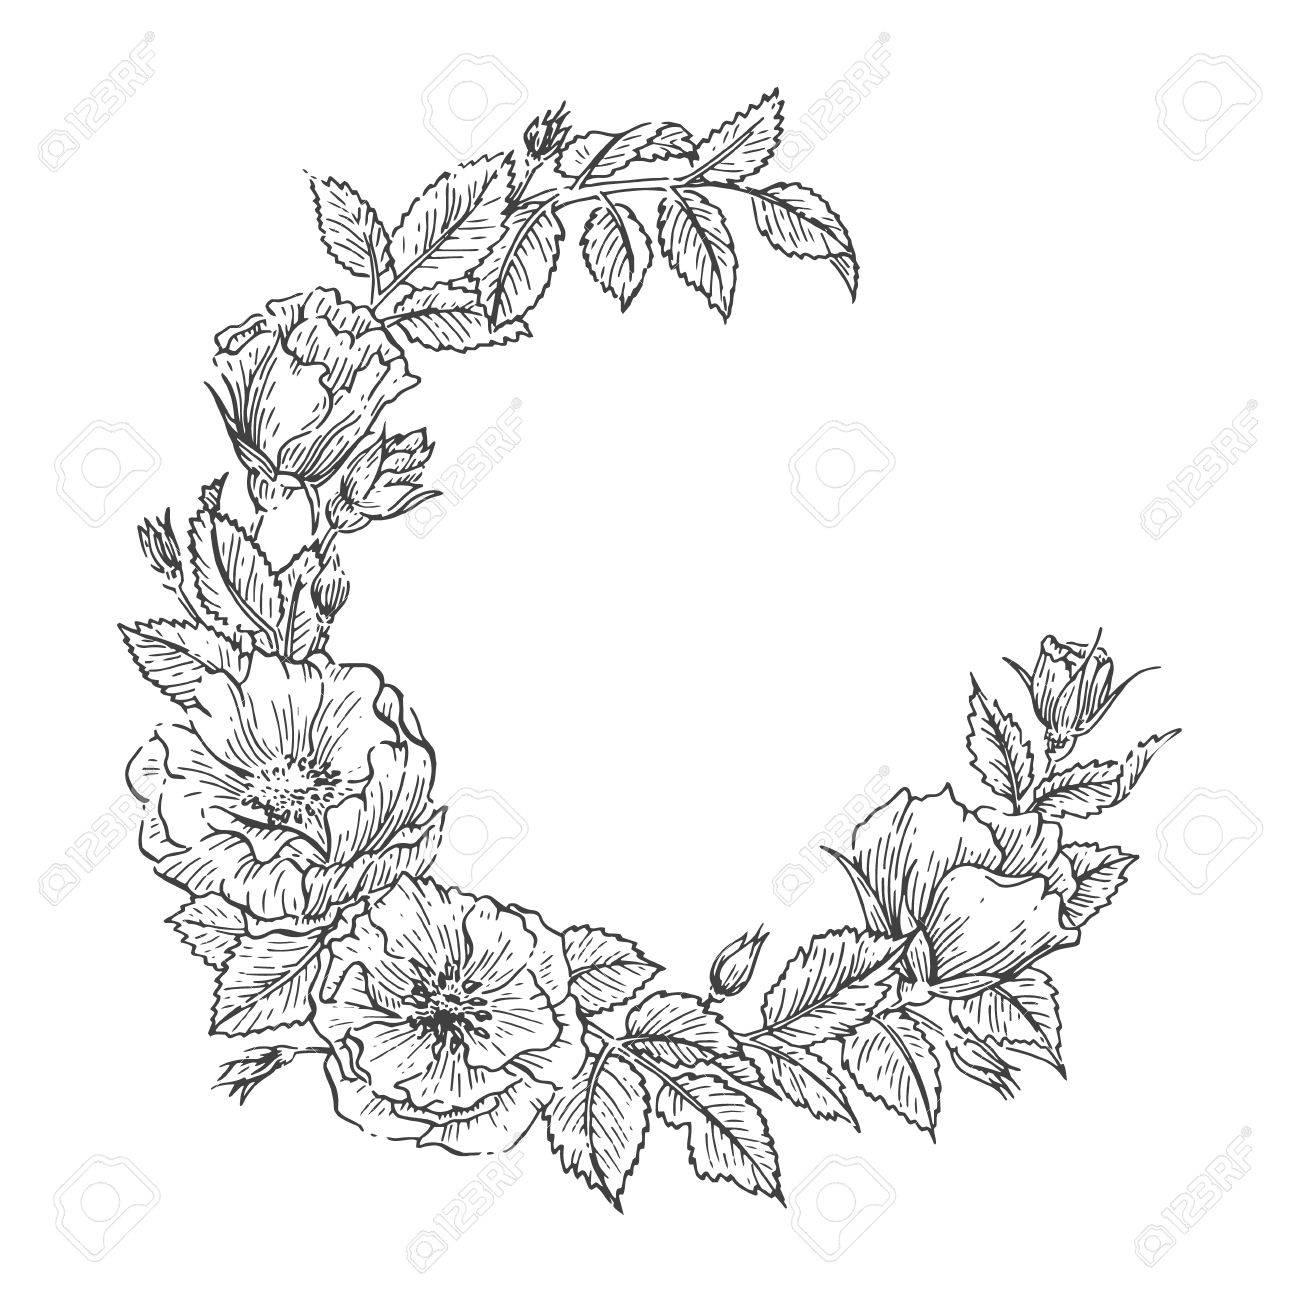 Hand Drawn Sketch Garden Floweral Wreath Vector Greeting Card